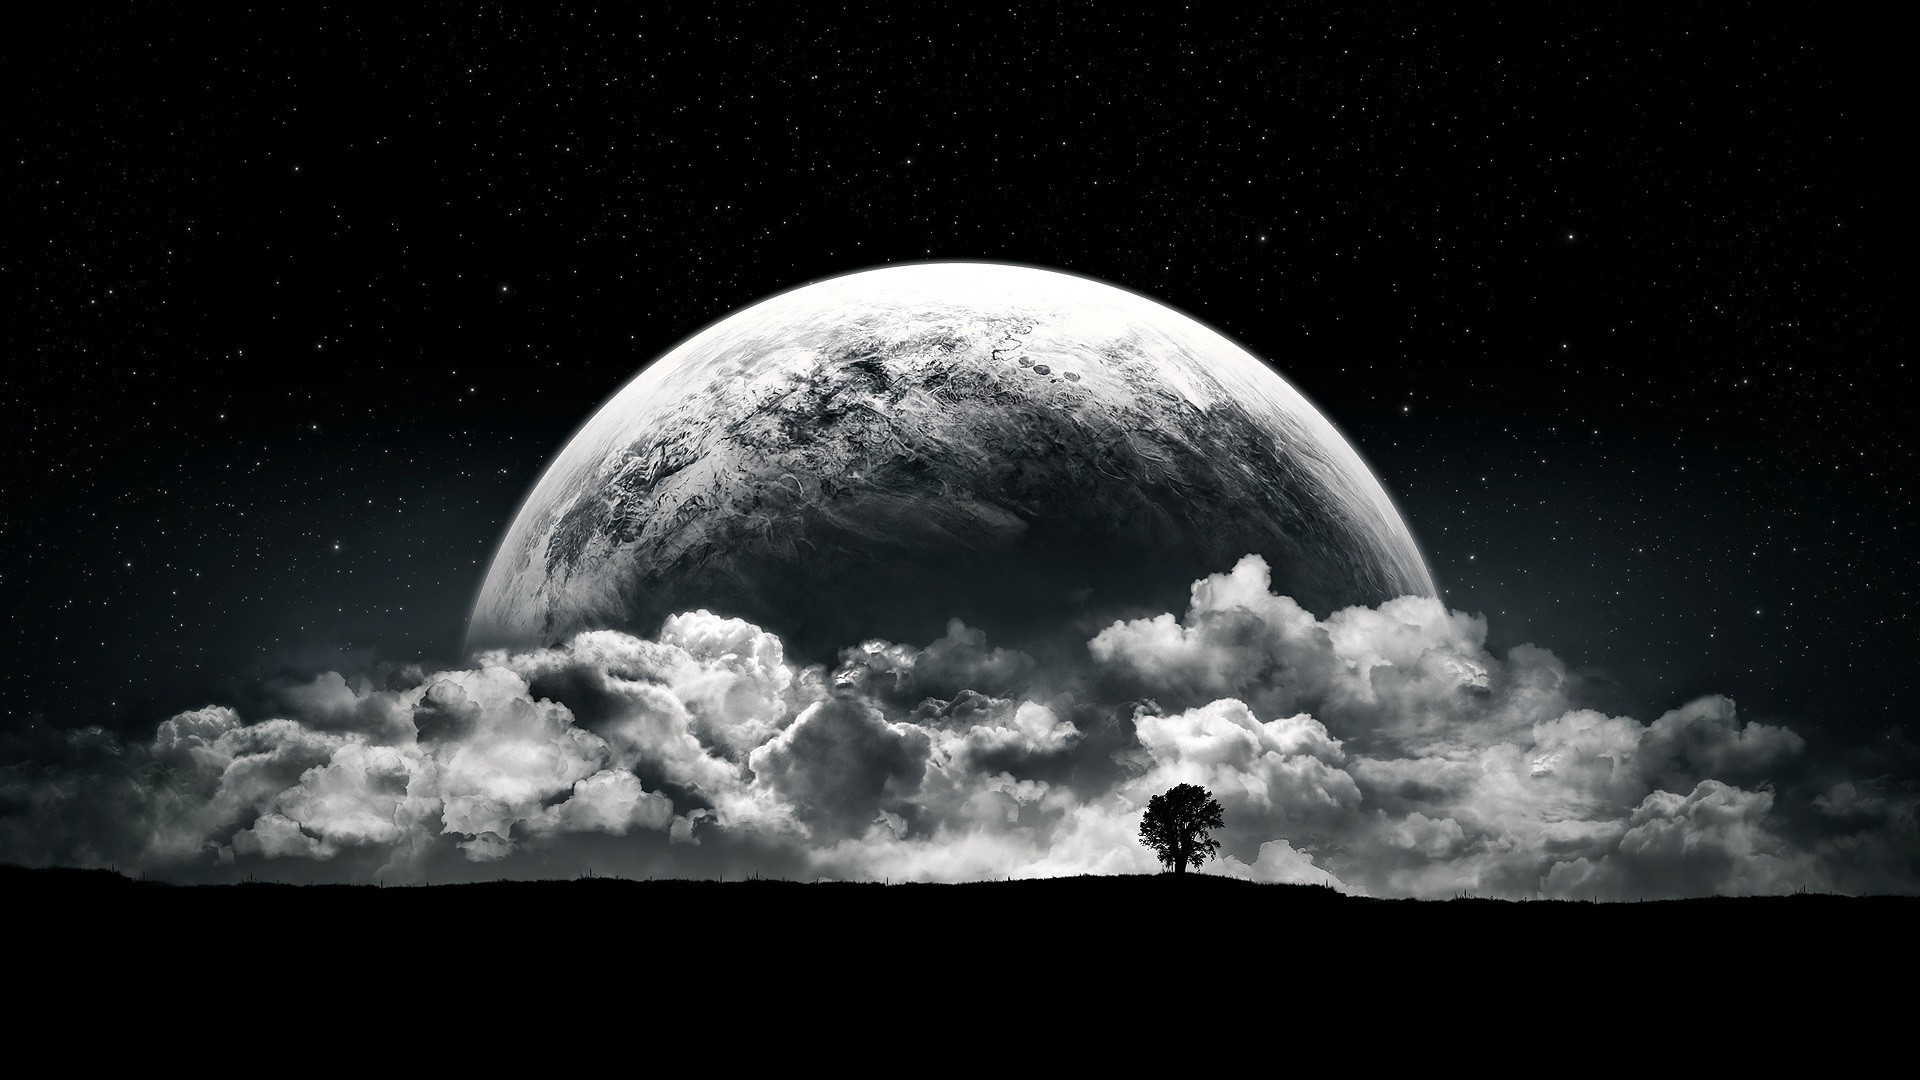 Moon Night Black And White 1920x1080 Download Hd Wallpaper Wallpapertip